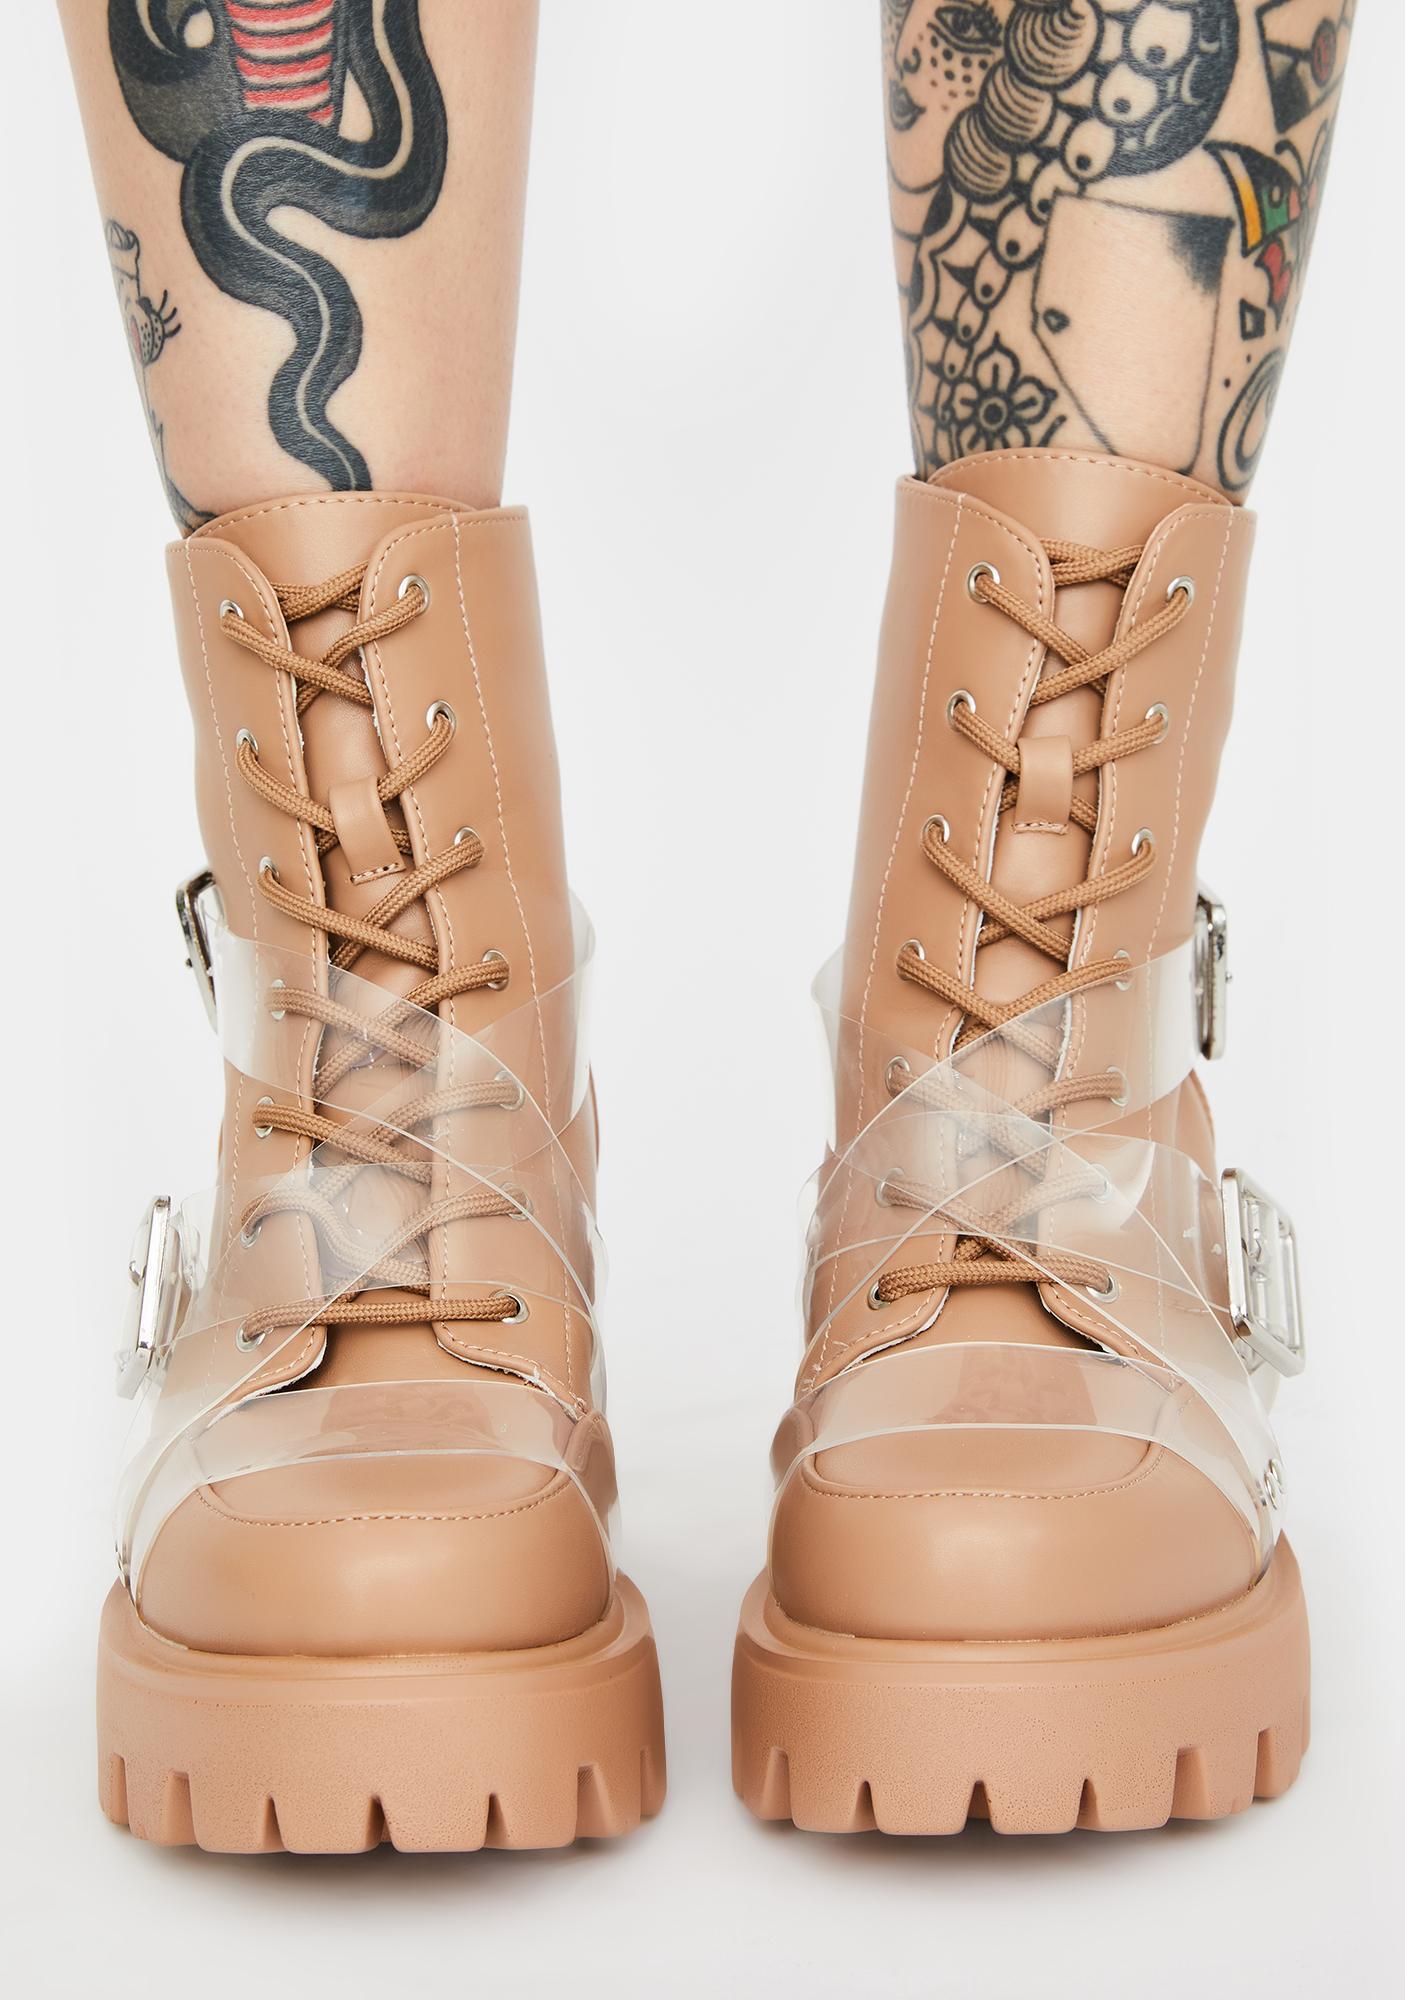 Influencer Status Combat Boots